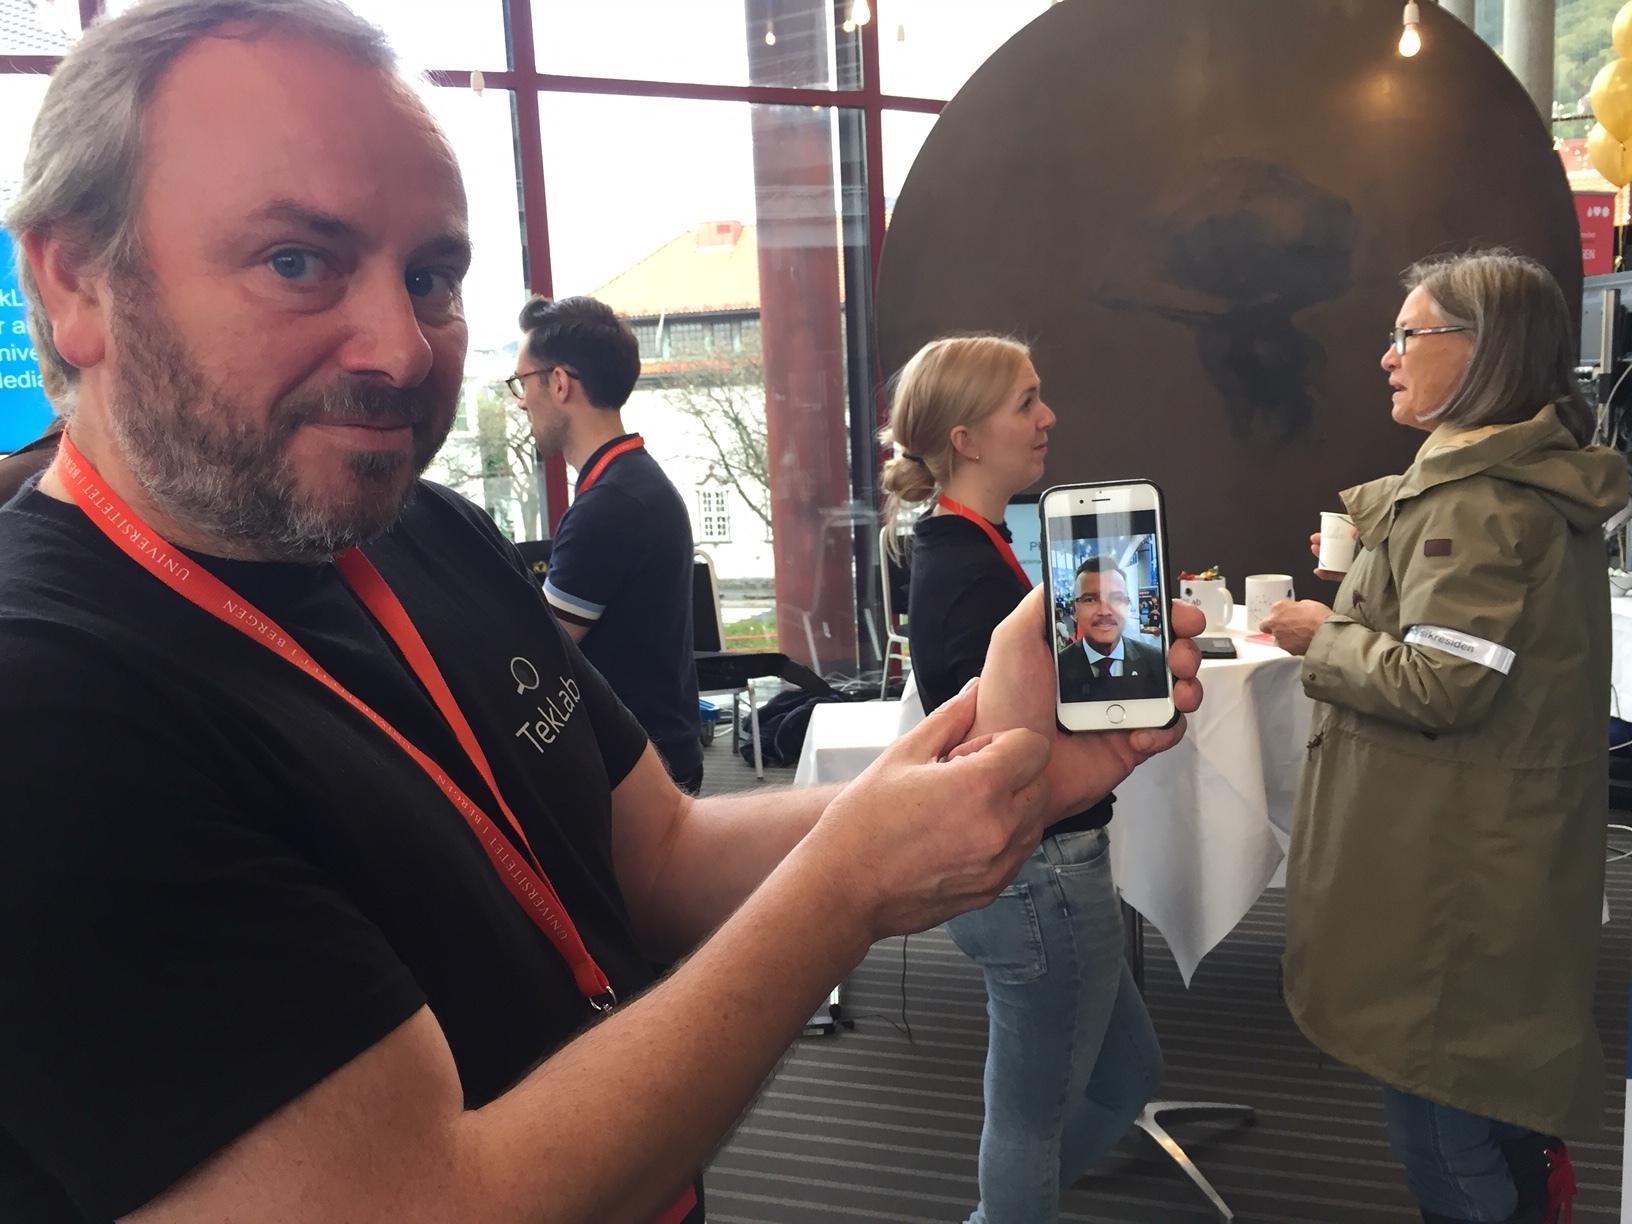 DEMONSTRATING: ViSmedia researcher Lars Nyre, showing people the app Prosopo. In the background, master student Camilla Mjøen Lien. (PHOTO: Astrid Gynnild/ViSmedia)